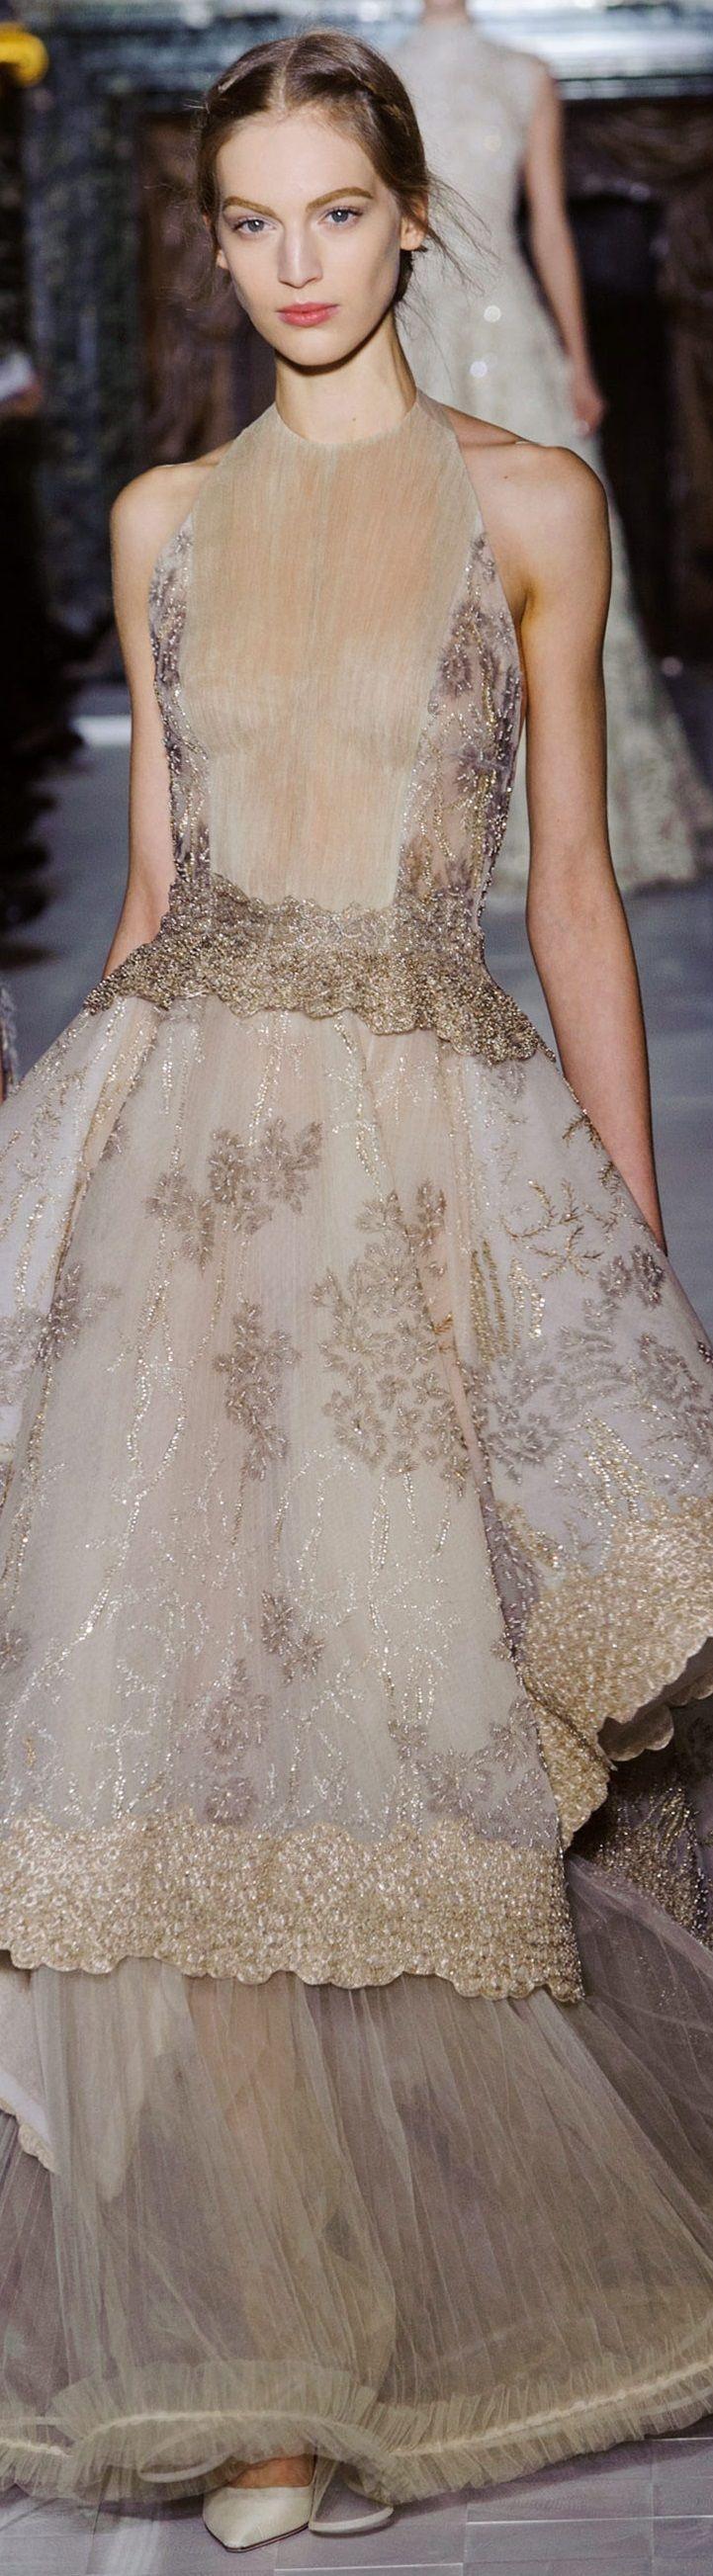 233 best Beautiful Dresses & Gowns images on Pinterest | Dream dress ...